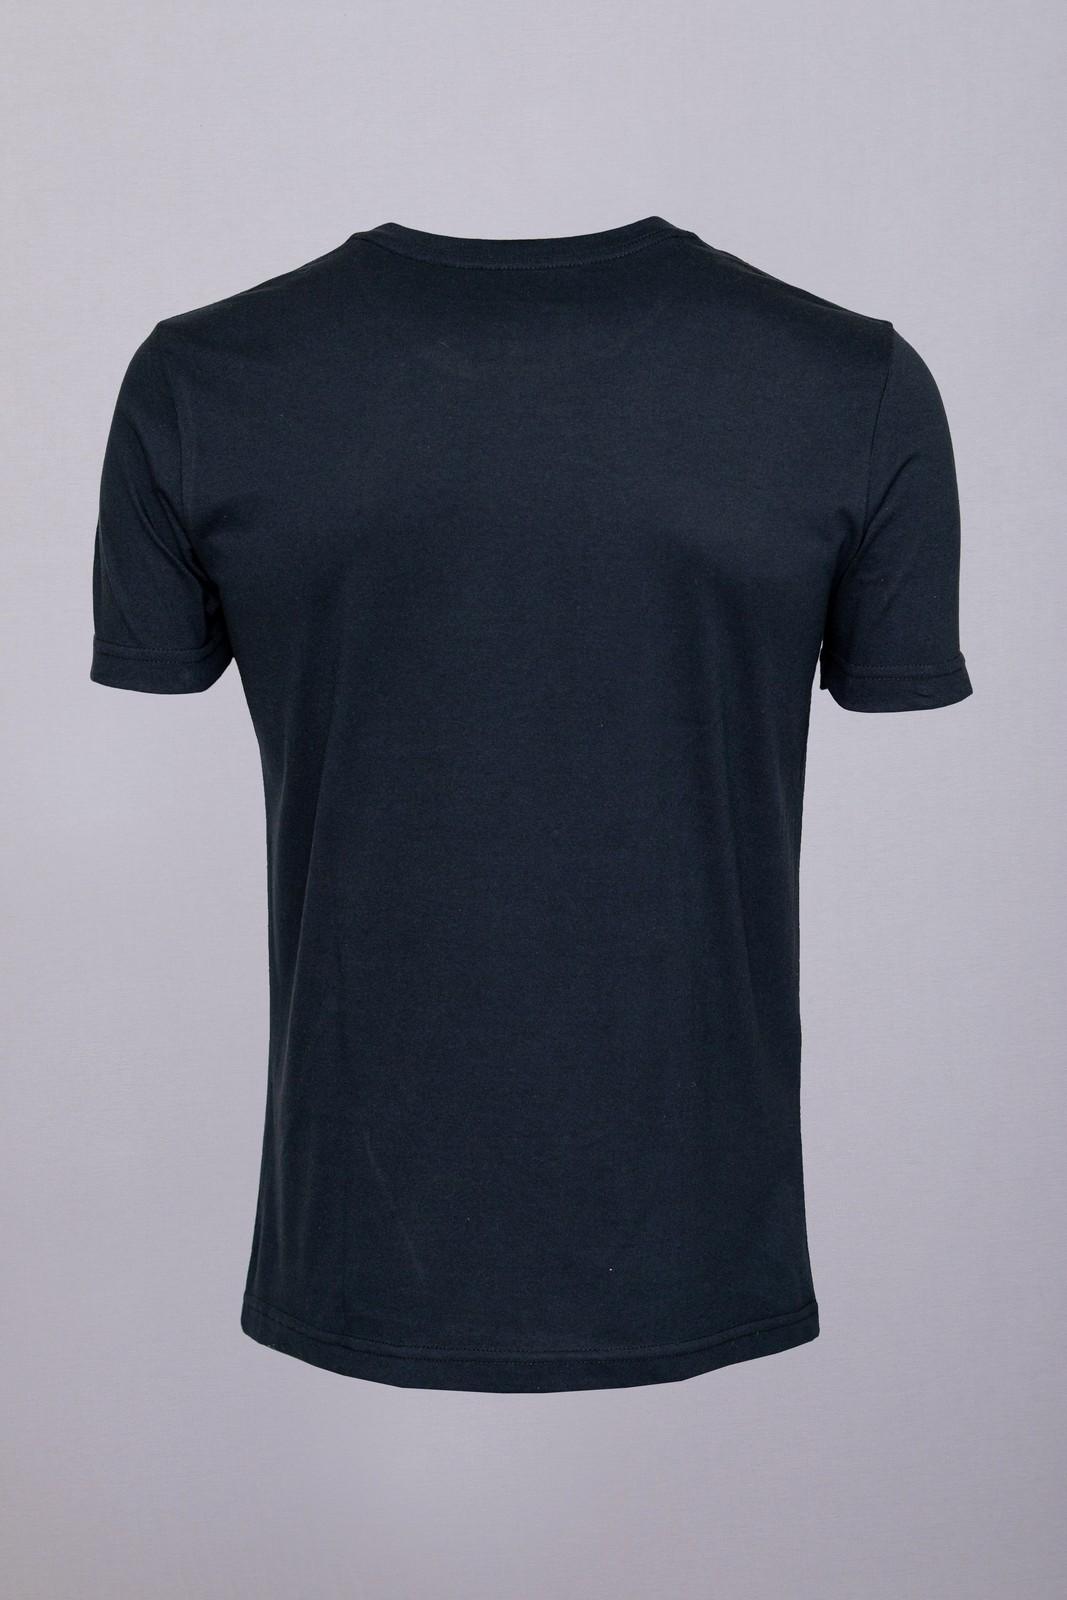 Kit Camisetas Barrocco Motos - 3 Camisetas Cor Preta/ Tamanho GG